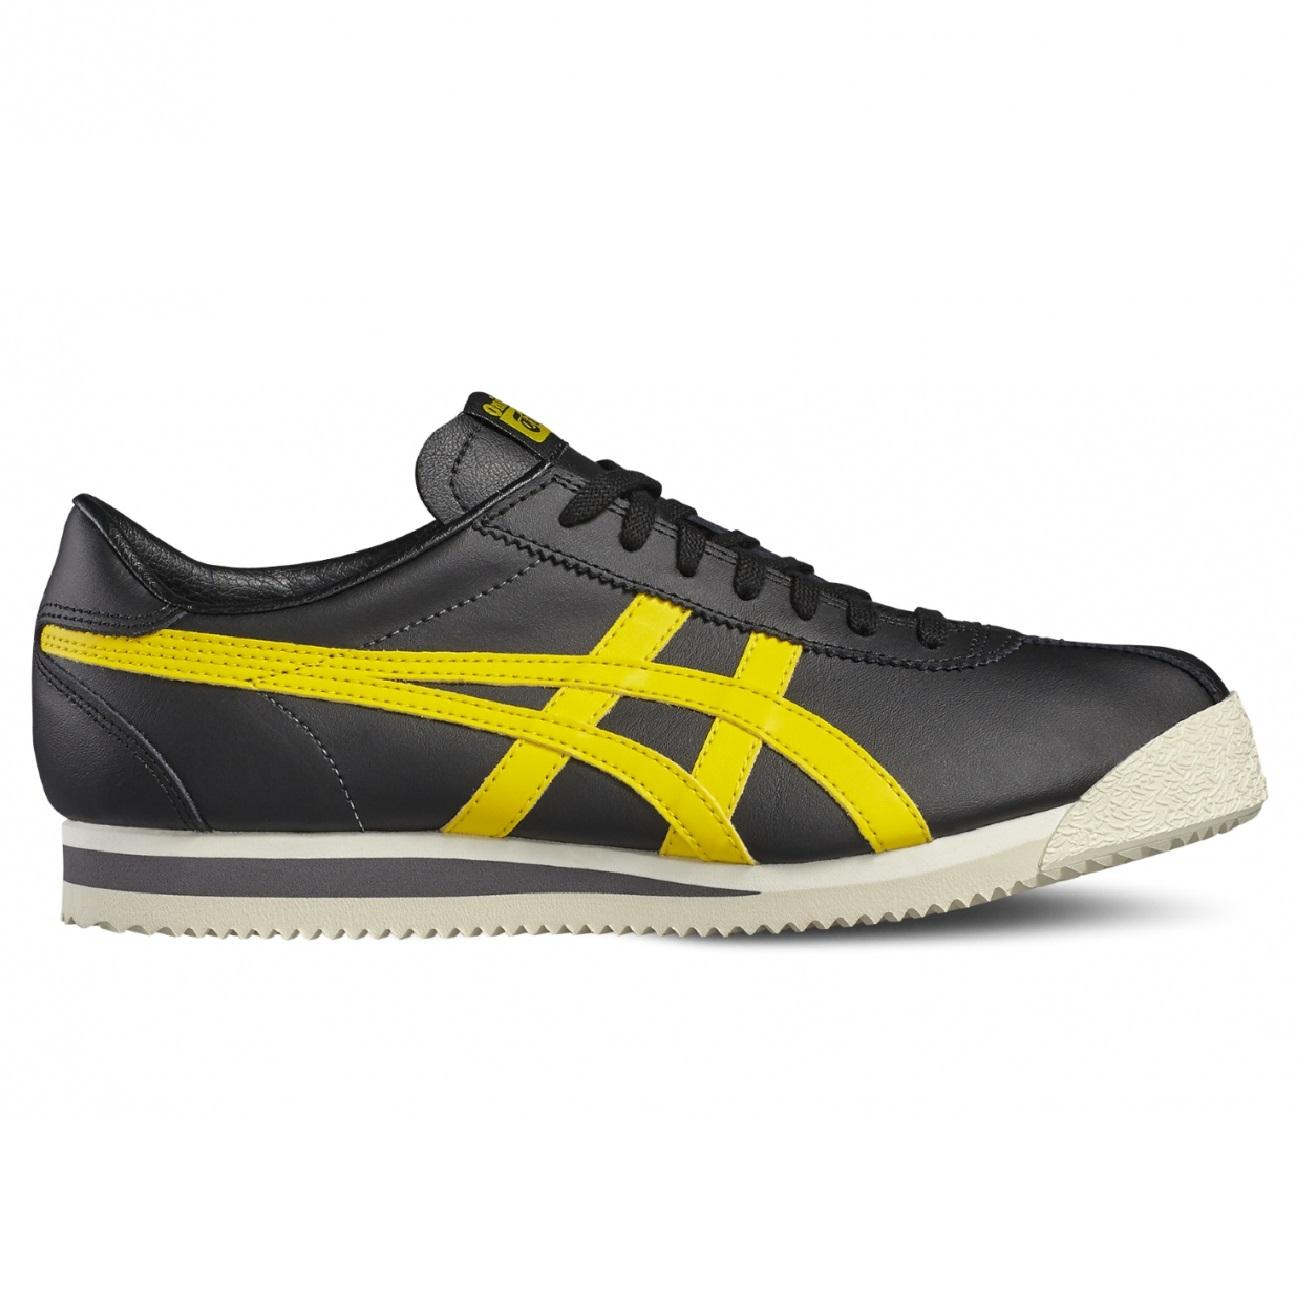 sport klingenmaier asics tiger corsair sneaker herren schuhe schwarz gelb online kaufen. Black Bedroom Furniture Sets. Home Design Ideas